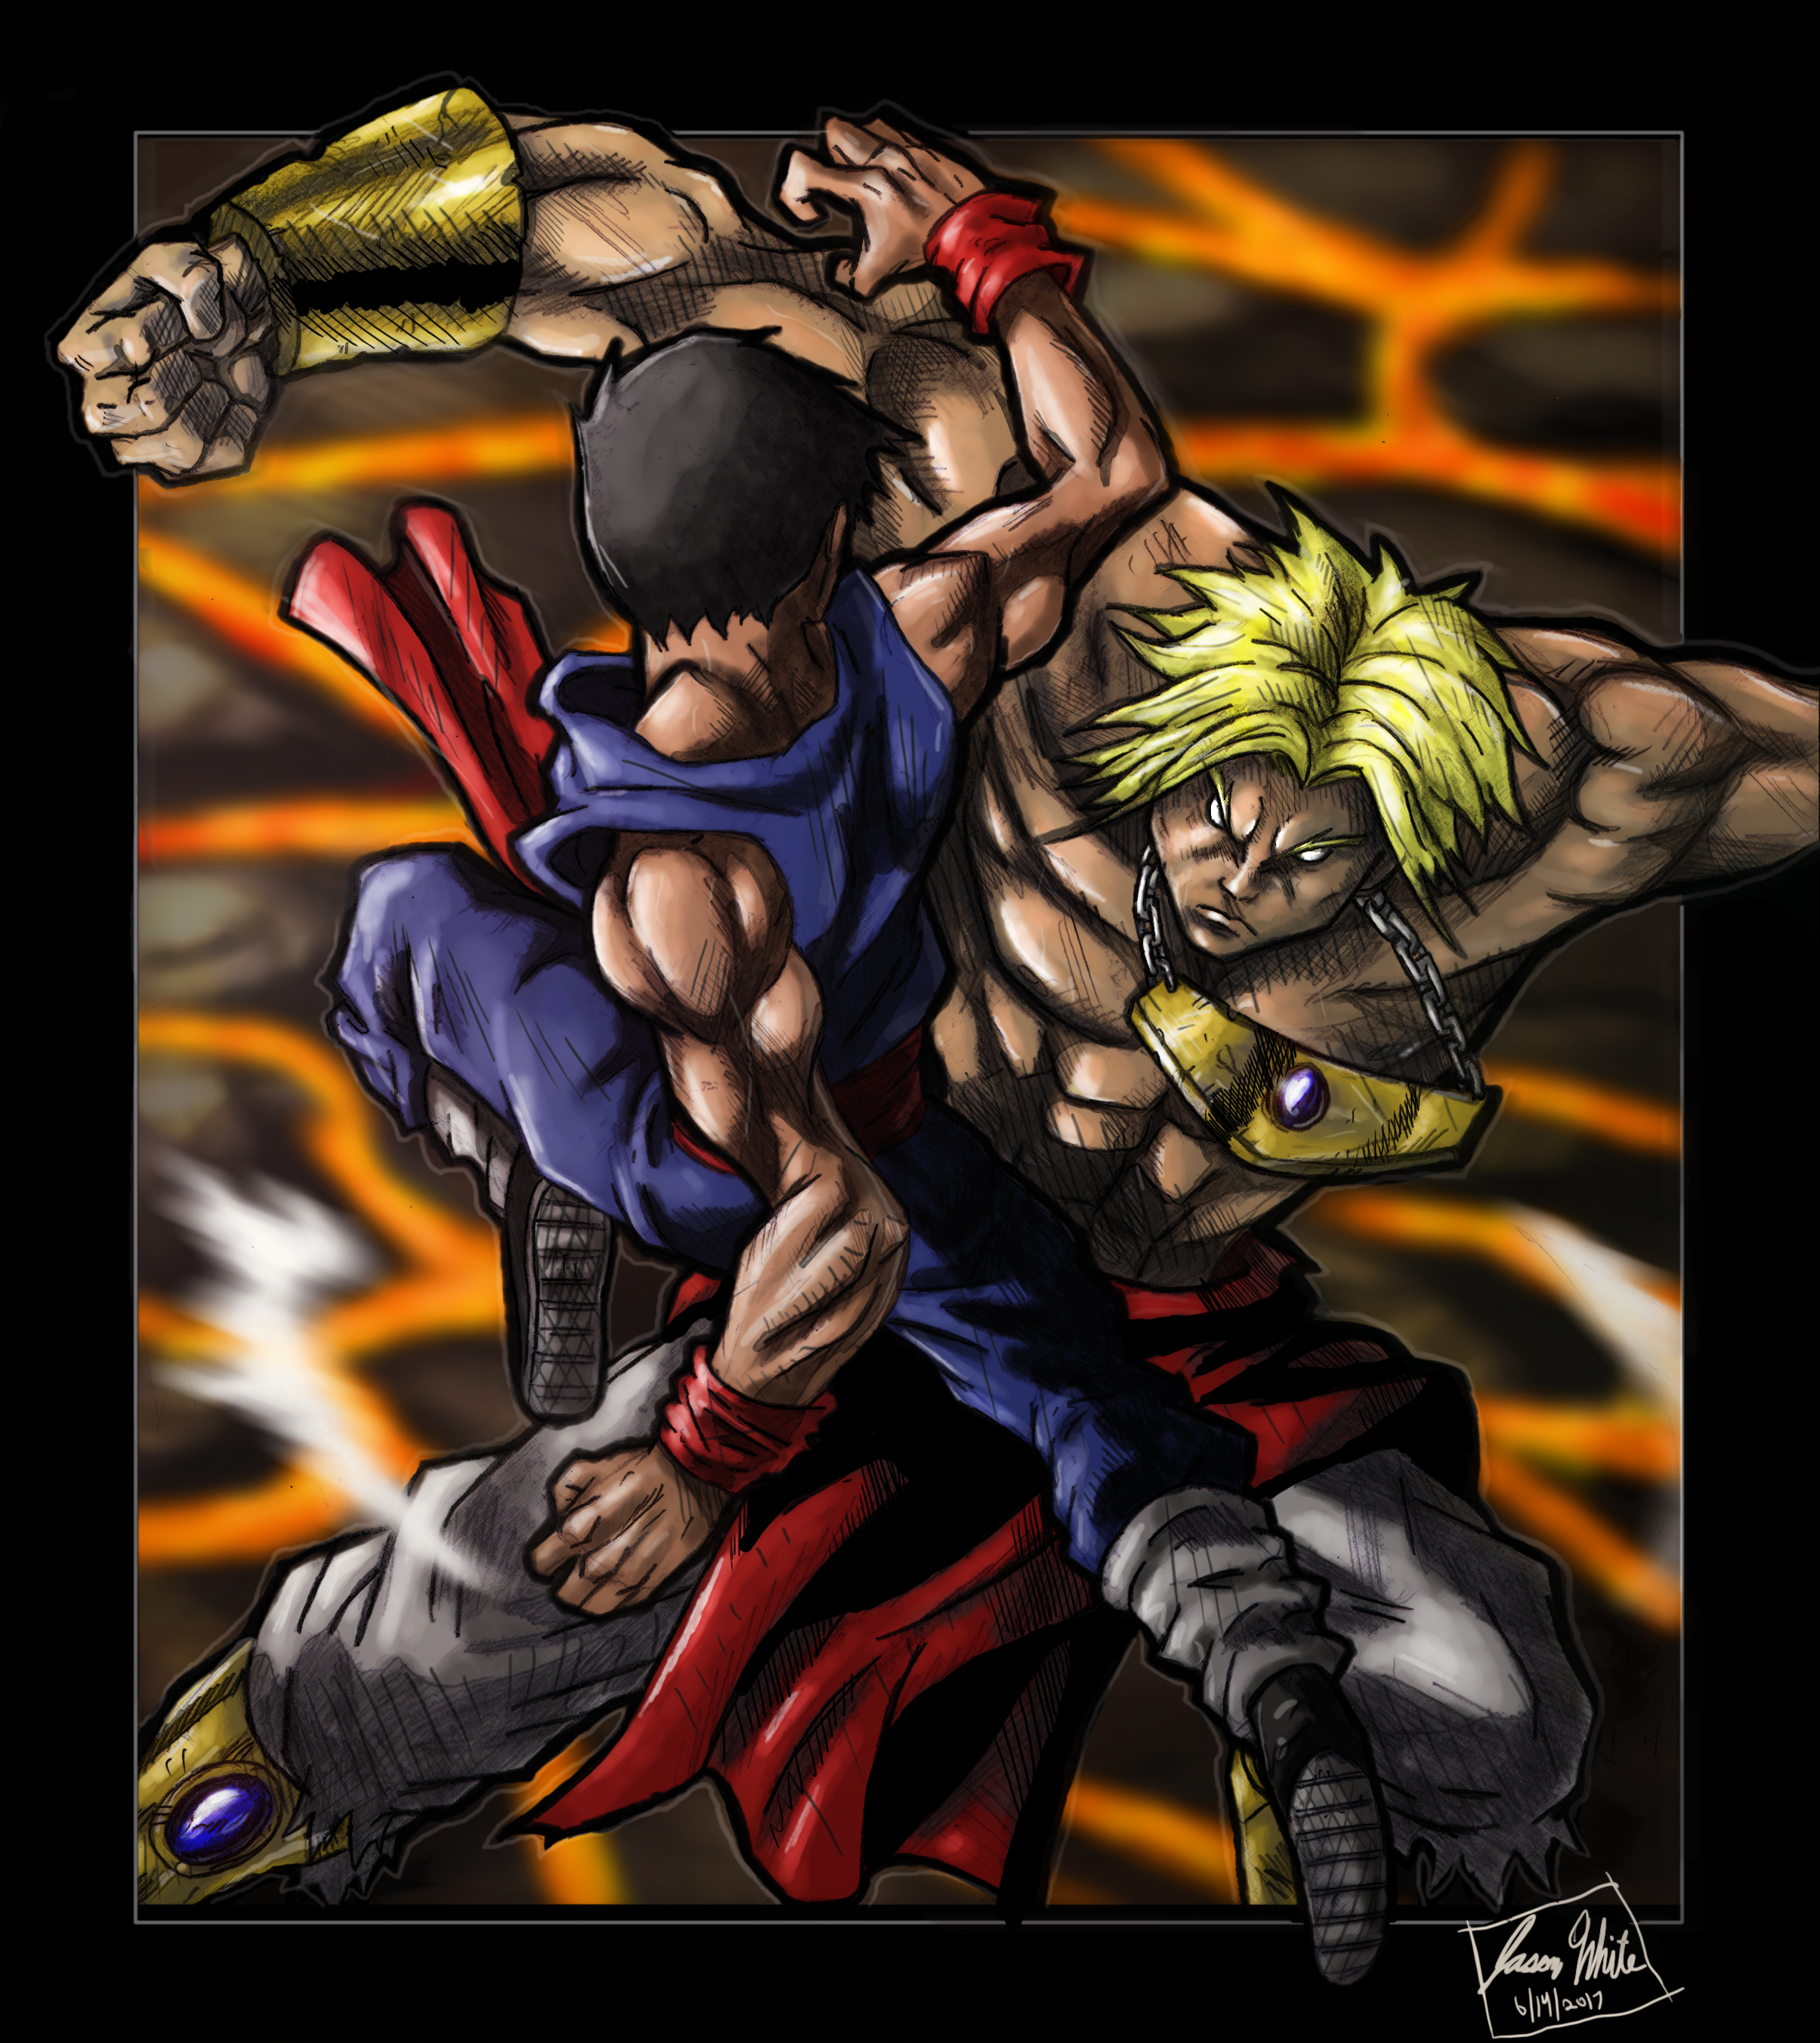 Broly vs Gohan (Joe Madureira style)